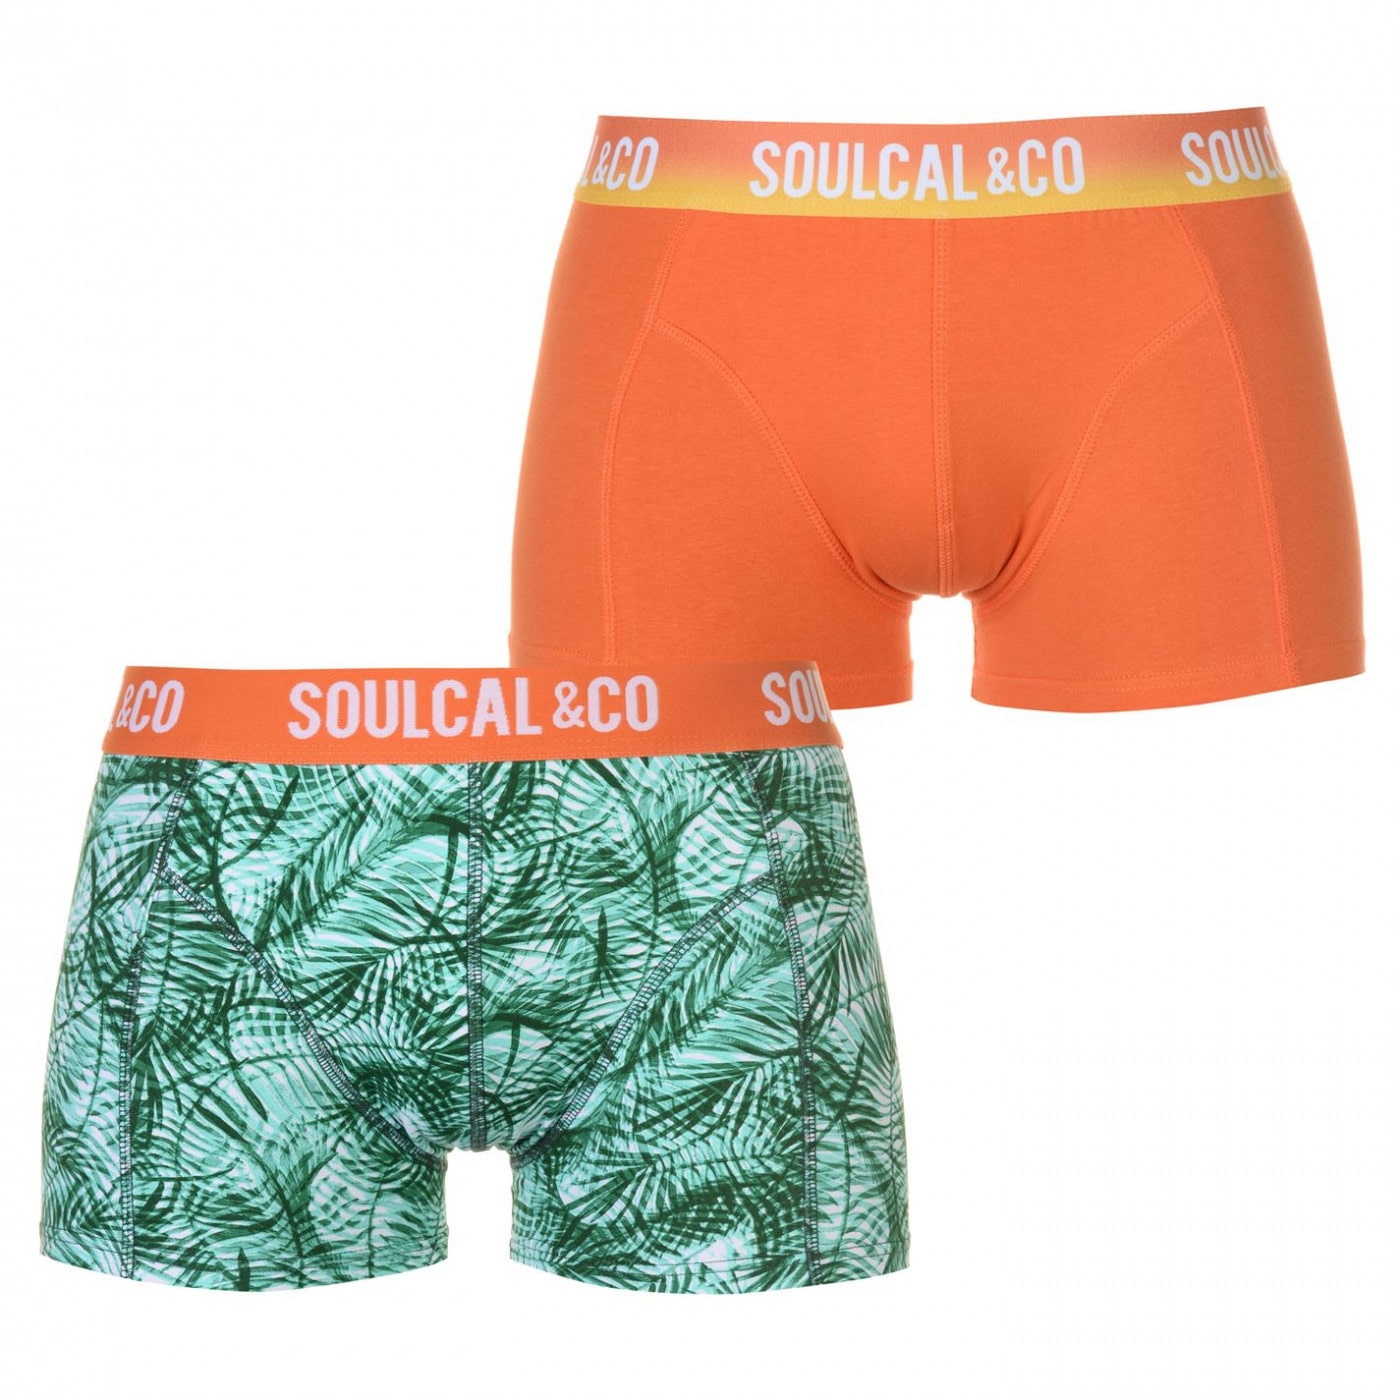 SoulCal Trunks Pack of 2